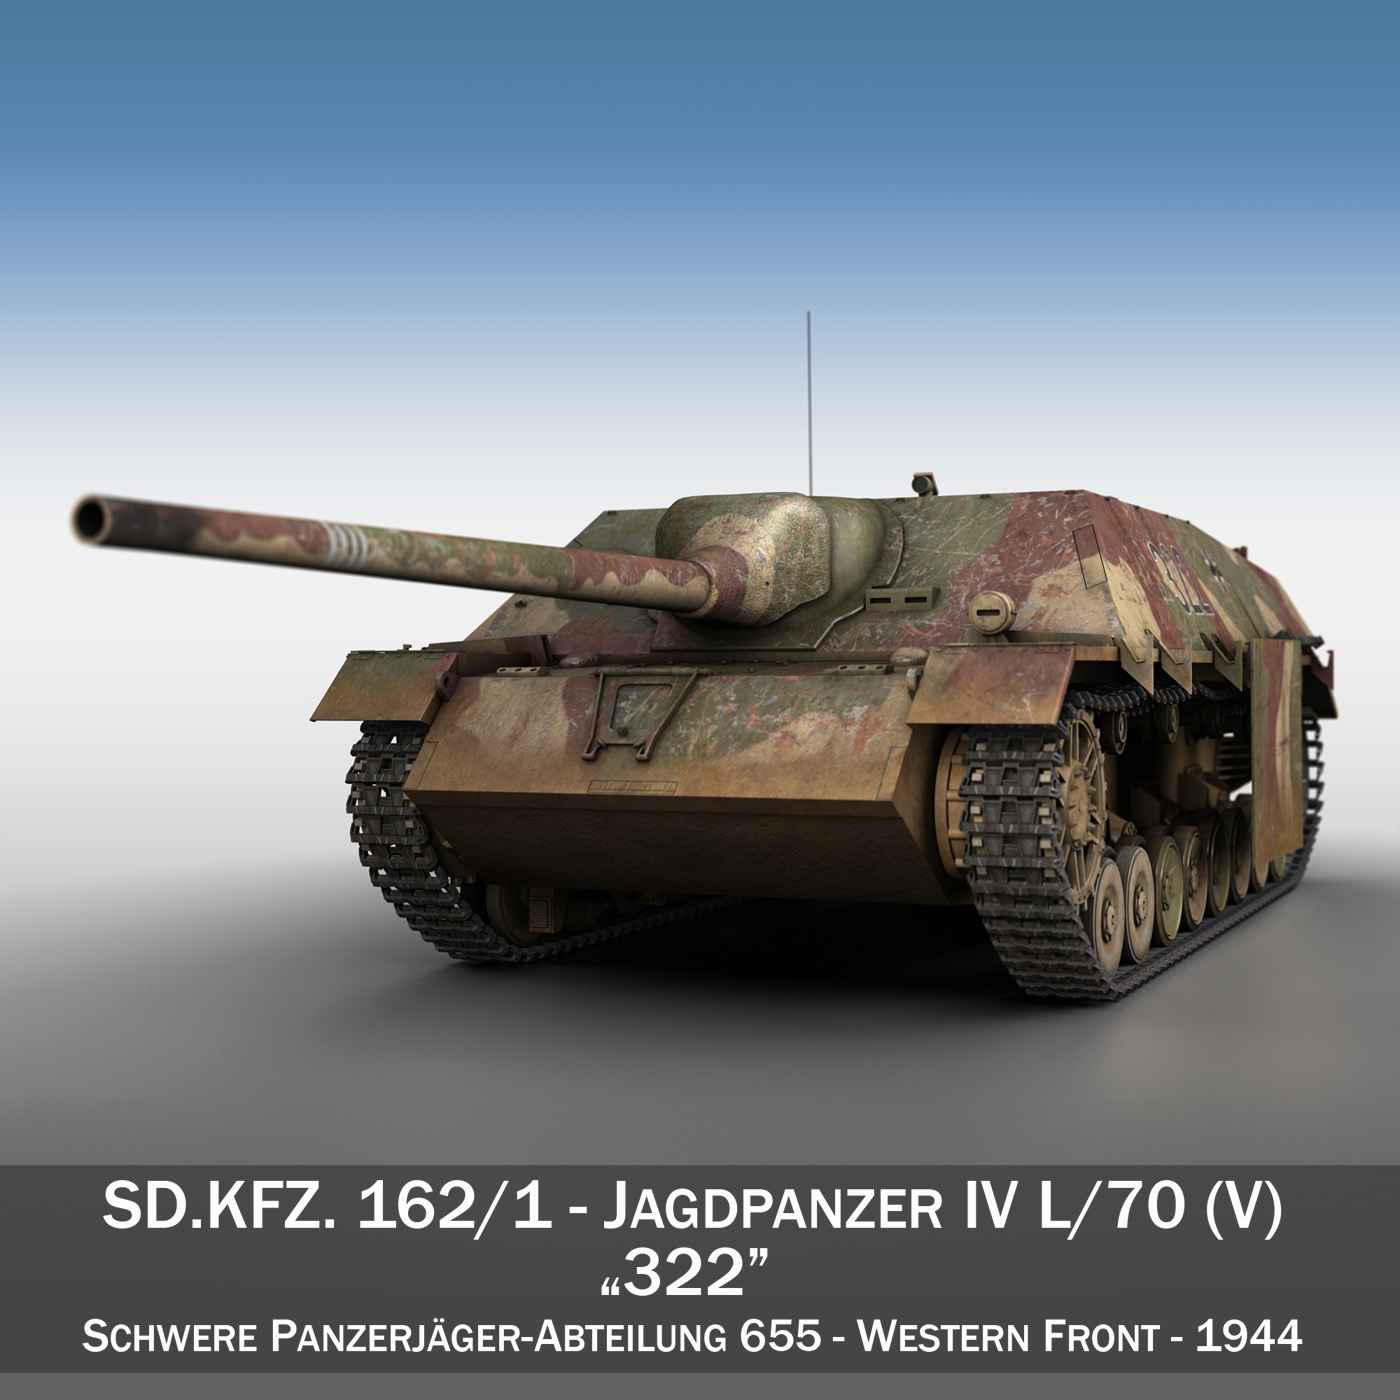 Jagdpanzer IV L/70 (V) - 322 - Late Production 3d model 3ds fbx c4d lwo lws lw obj 282346